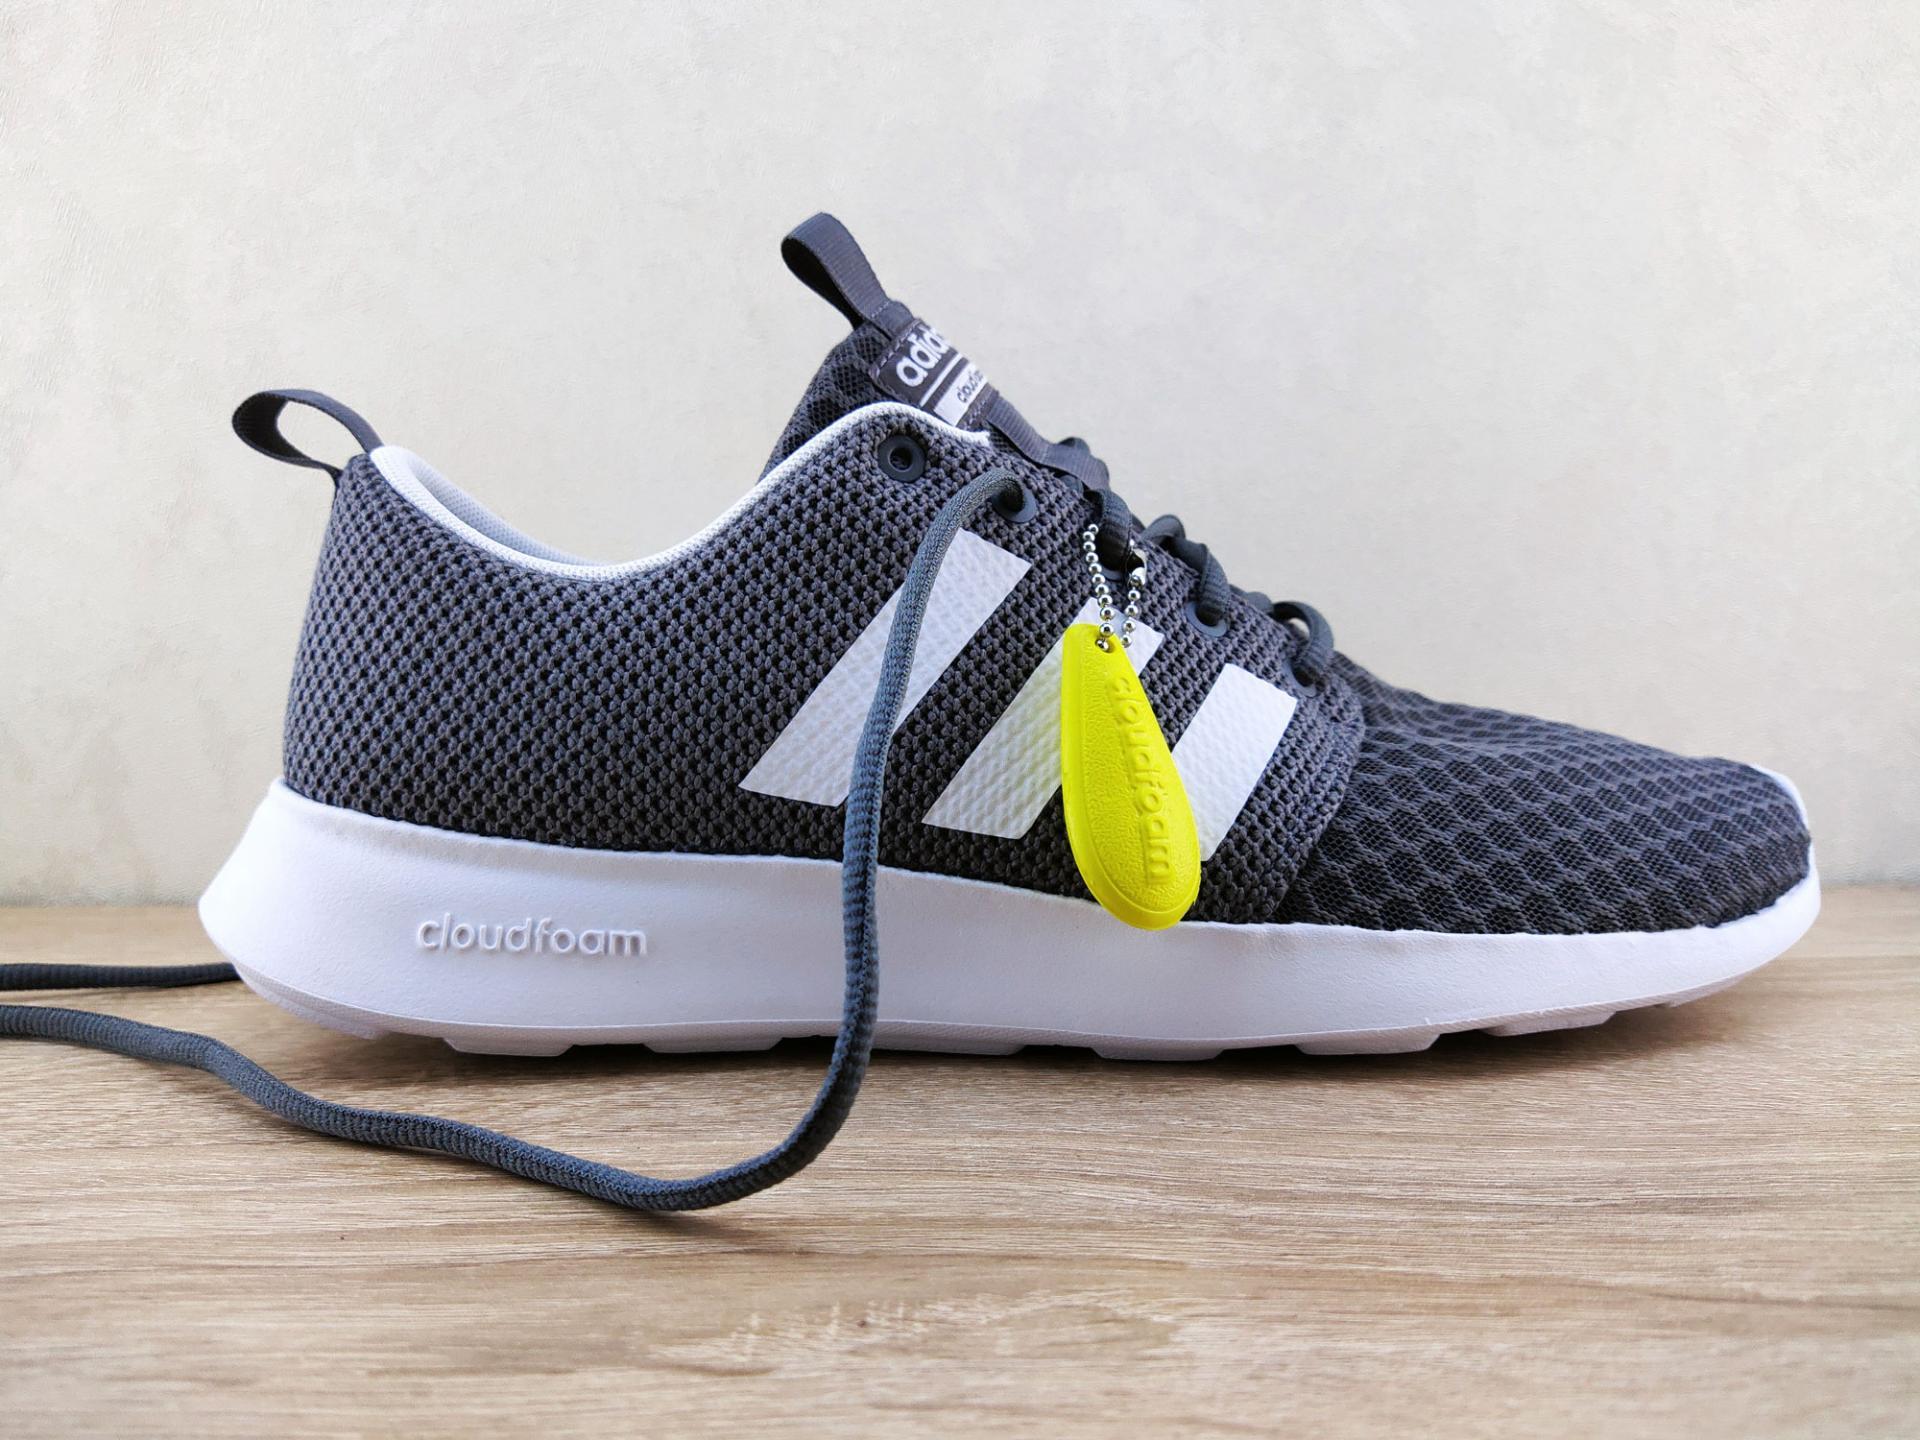 Тест-драйв кроссовок Adidas Cloudfoam SwiftRacer